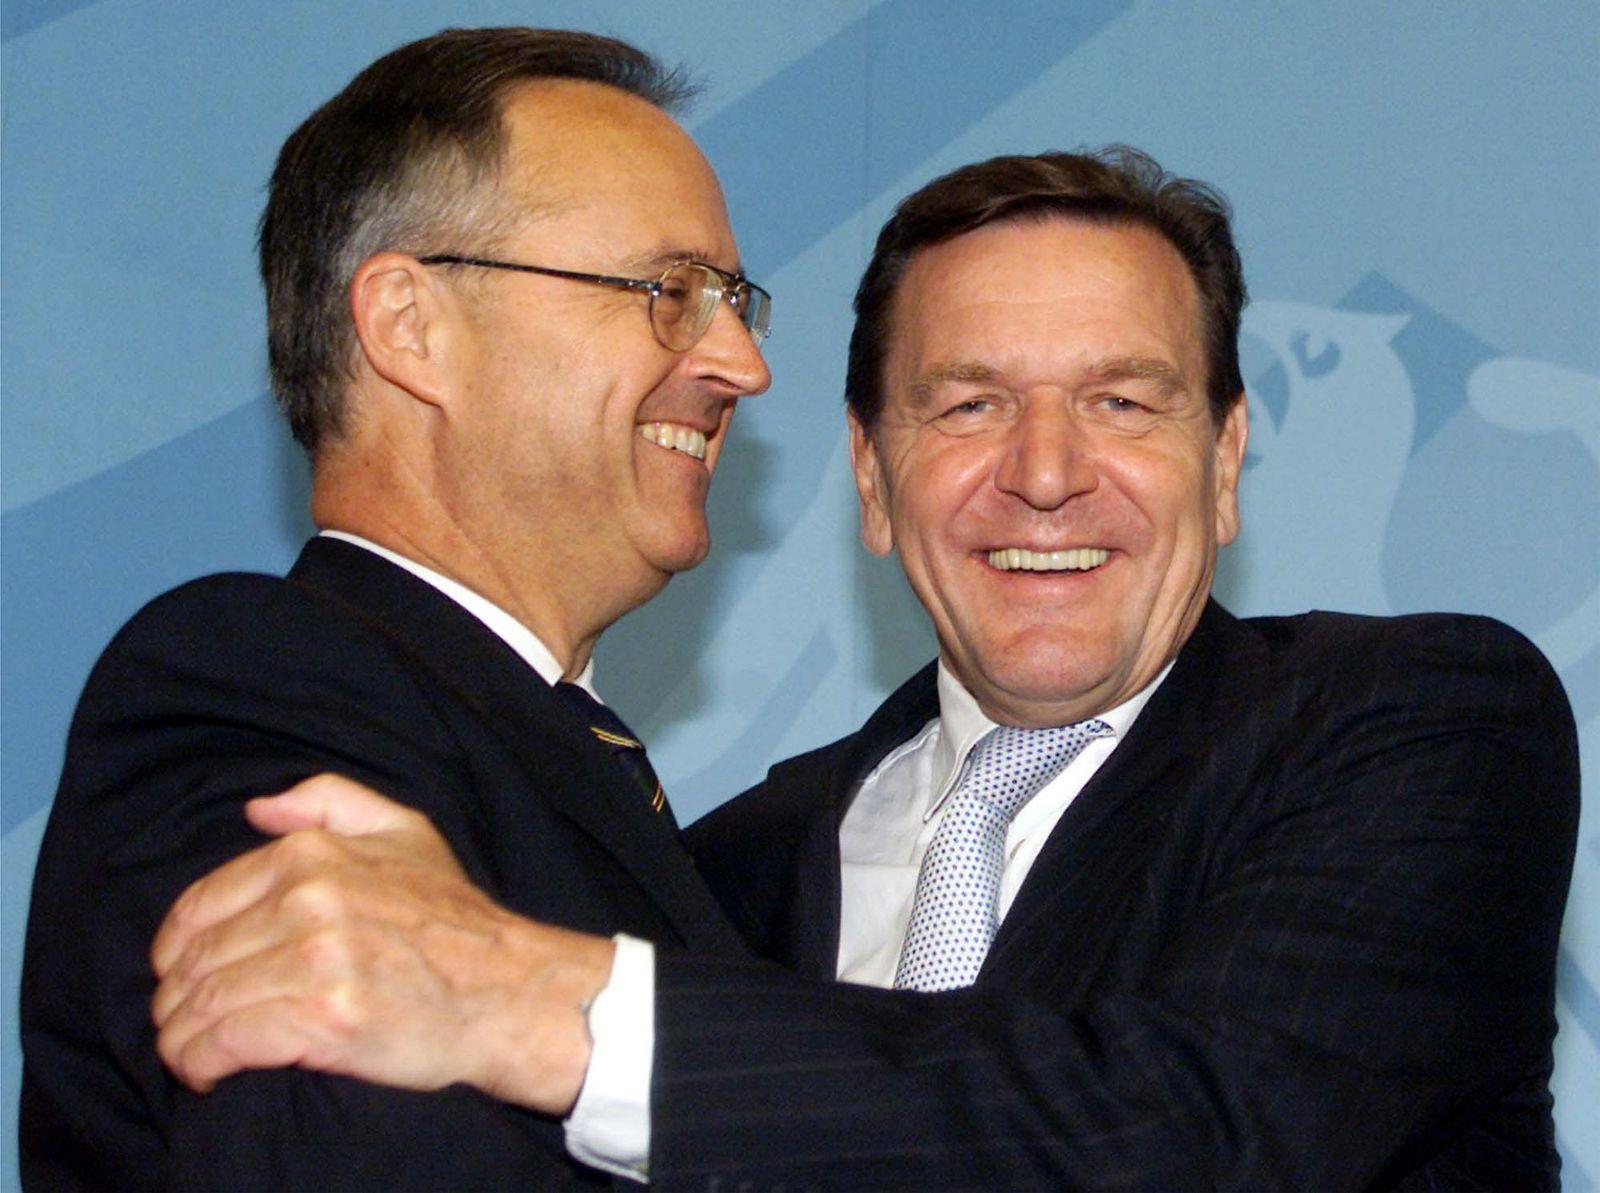 Gerhard Schroeder / Steuerreform